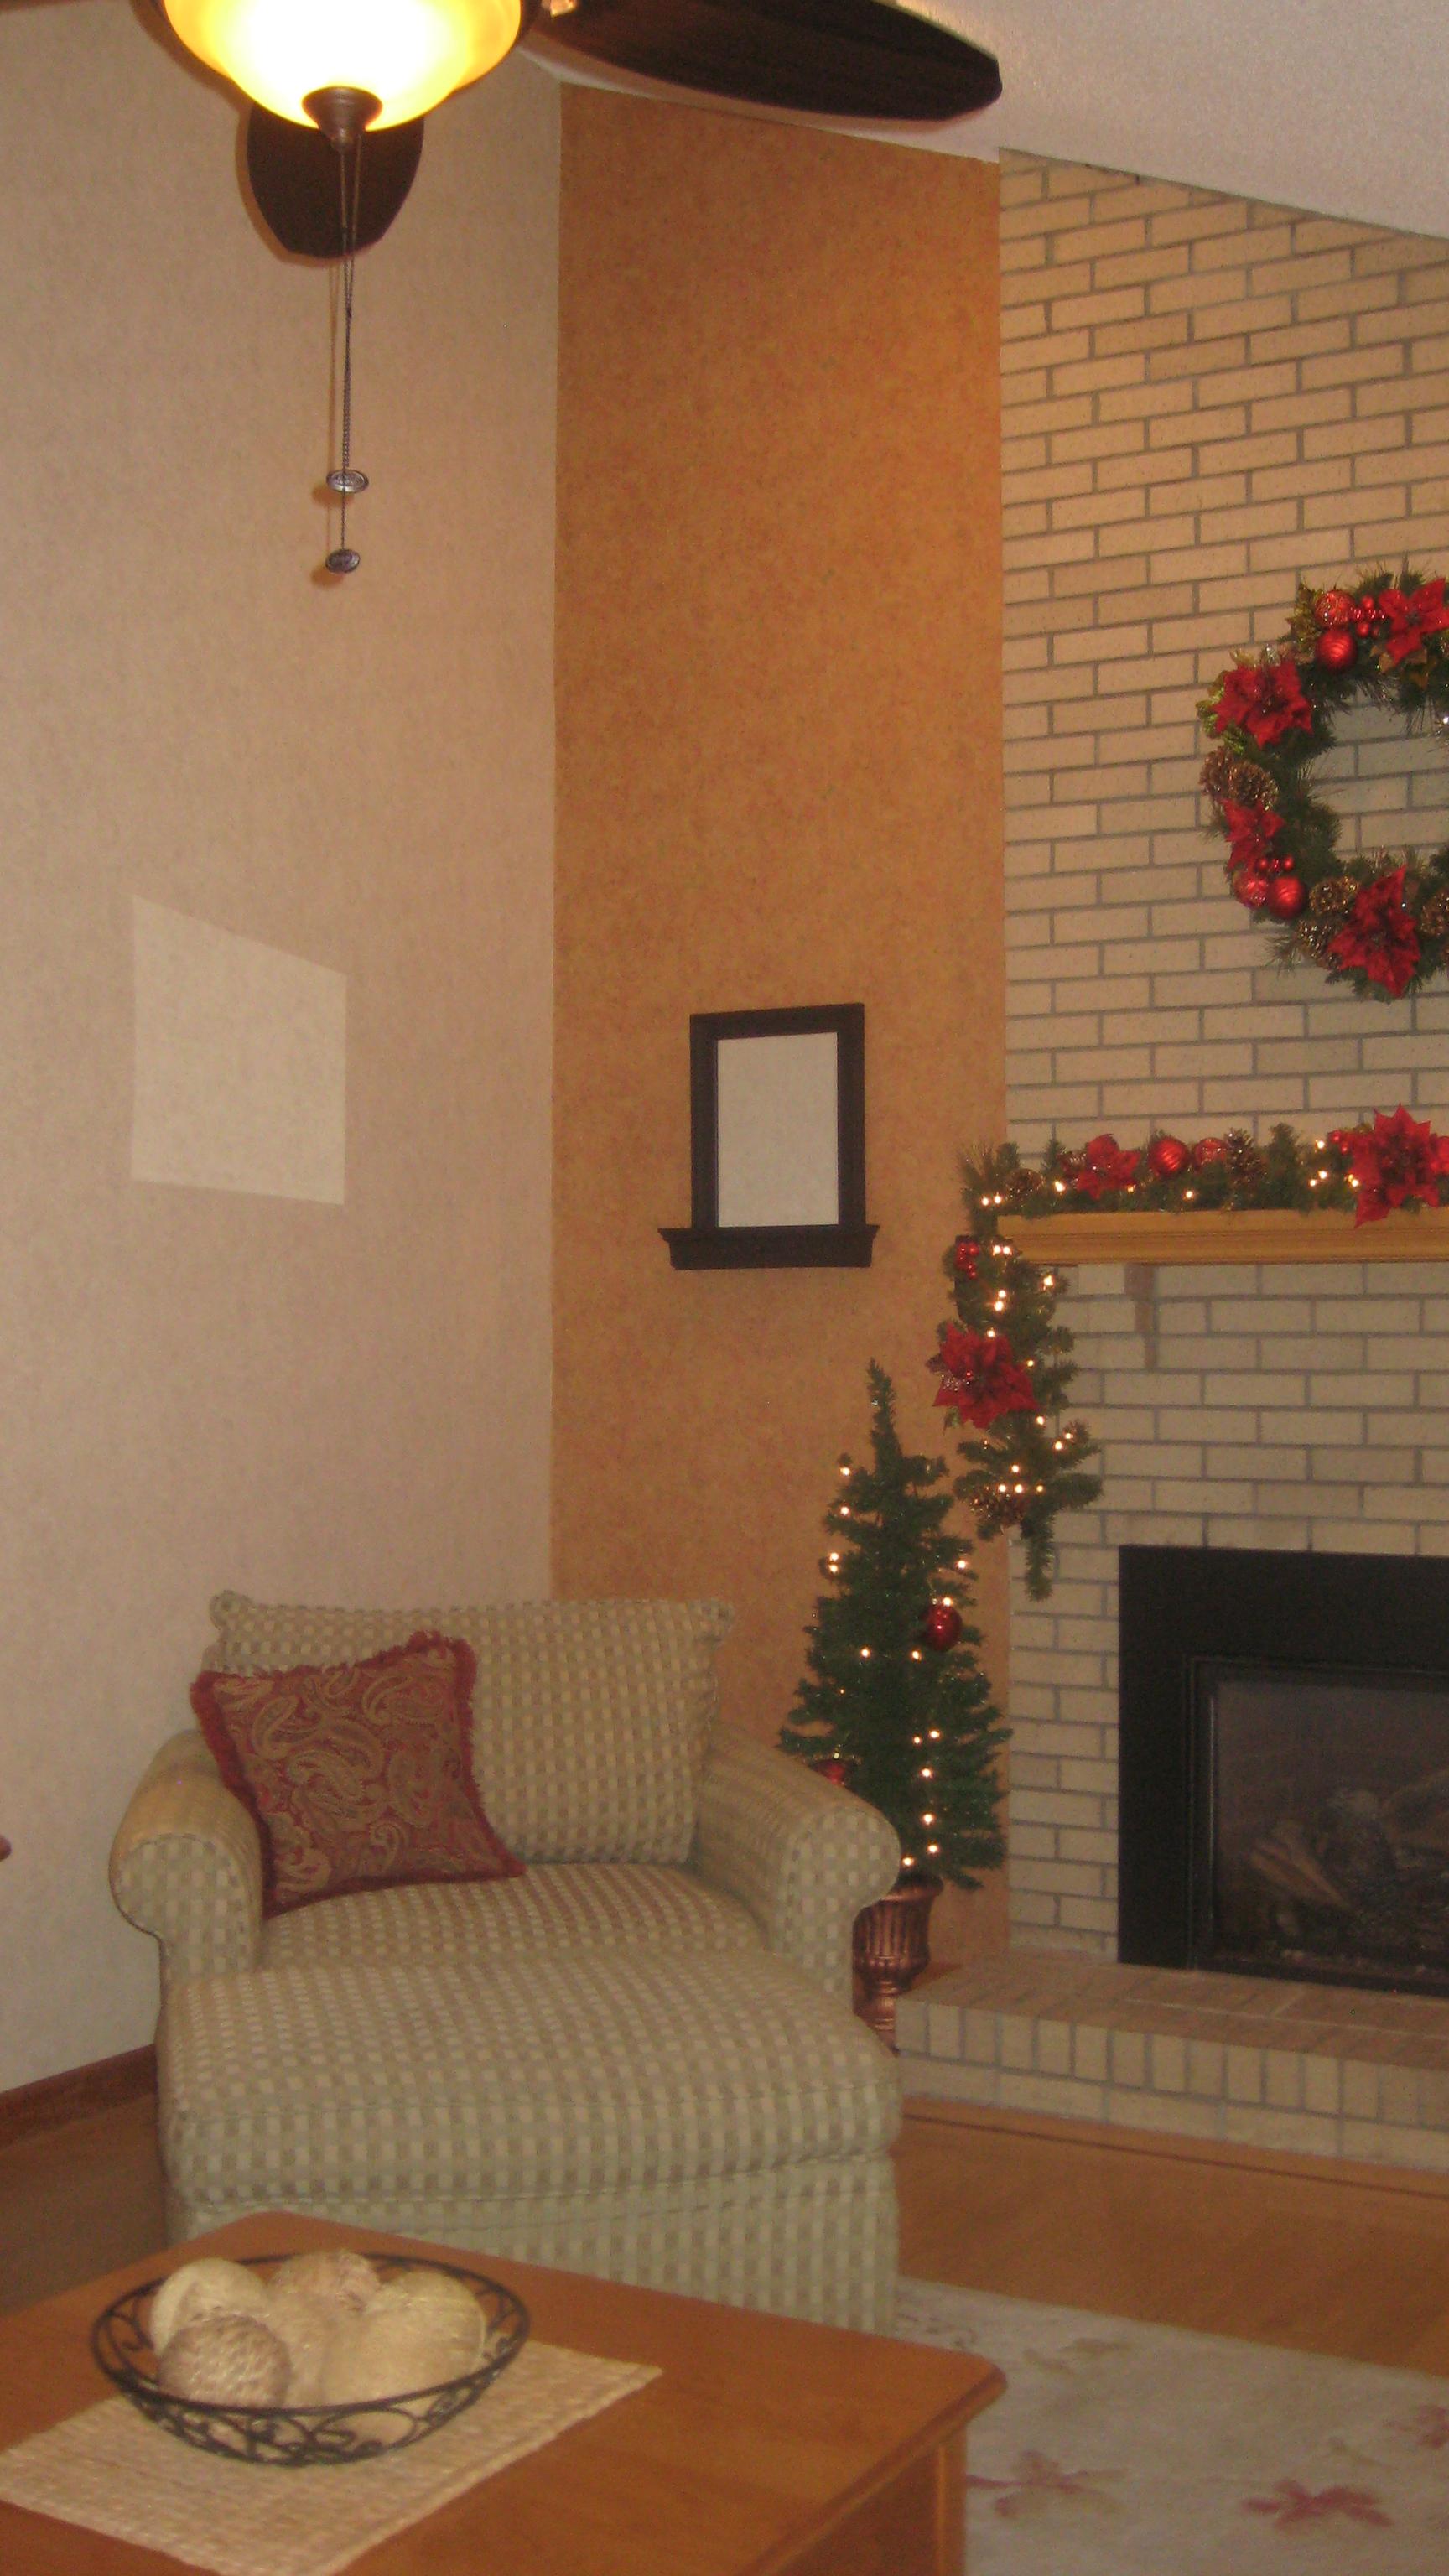 4d design residential great progress interior design for Home design 4d